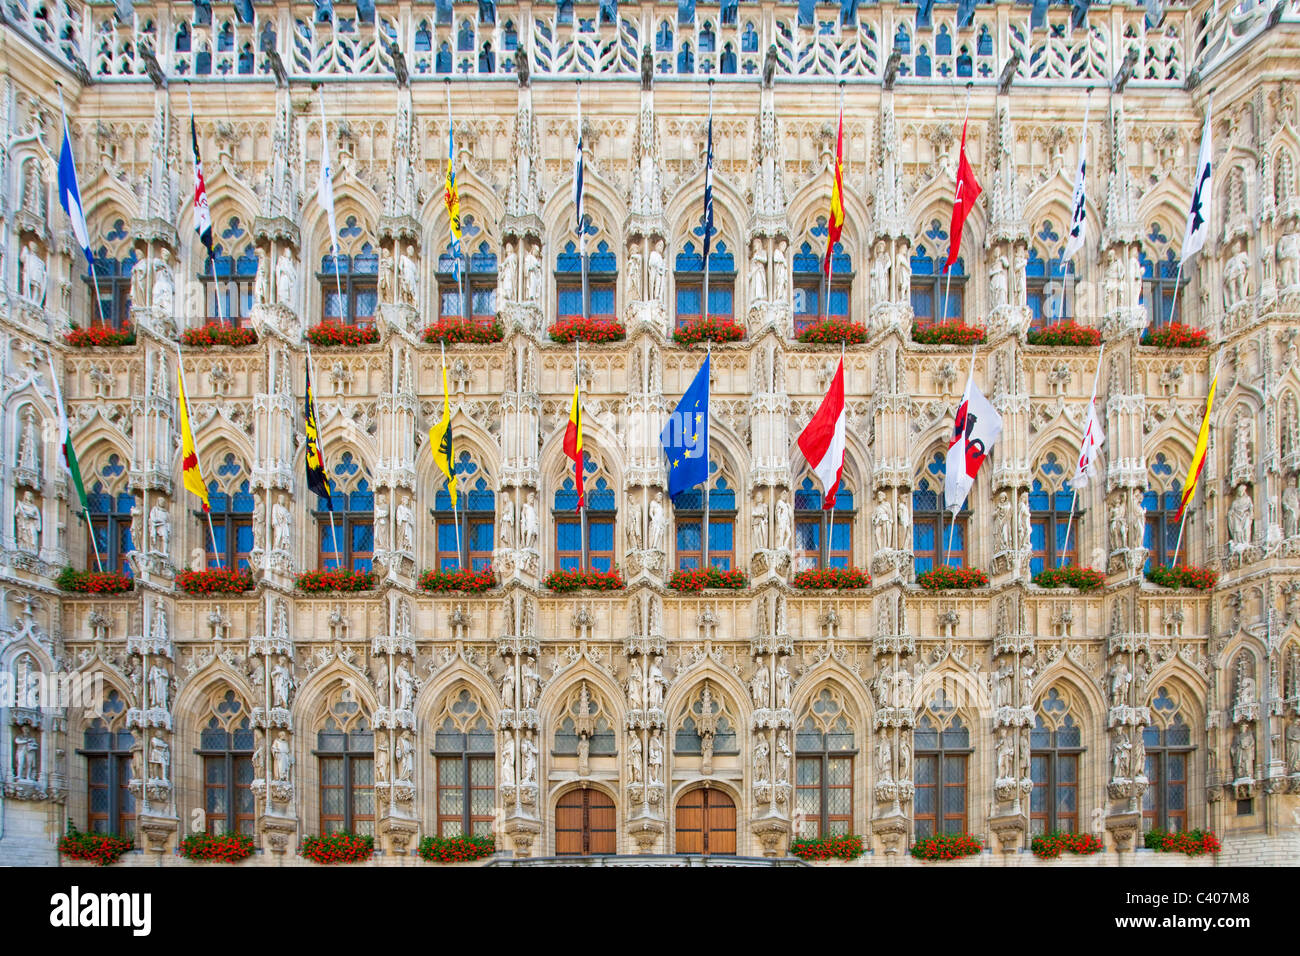 Belgium, Europe, Leuven, city hall, facade, Gothic, flags - Stock Image